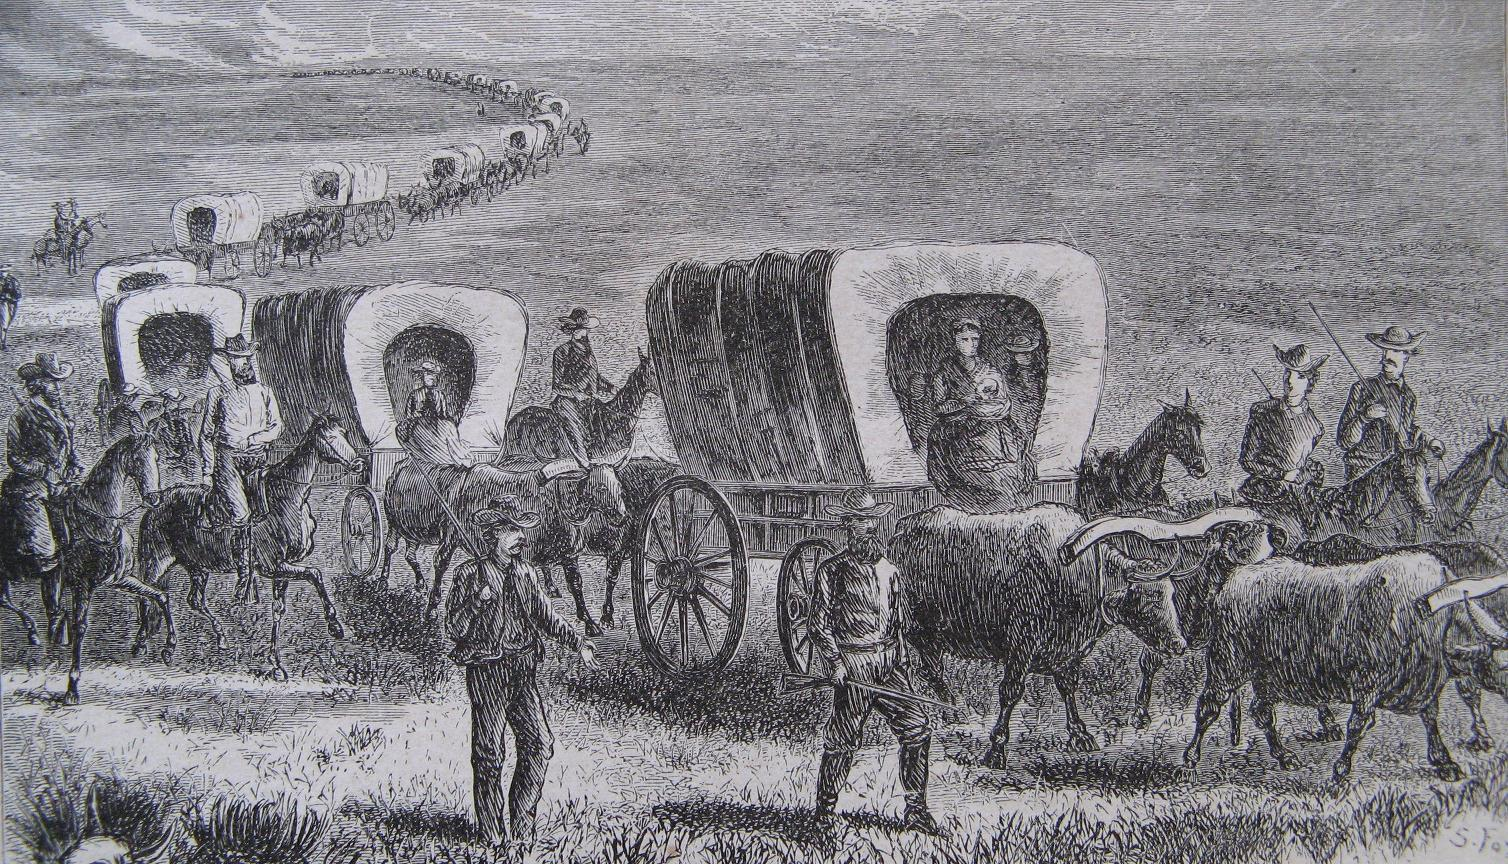 pioneer wagon train. zenberg blogue: days of 47 - pioneer day 2010. 3. mormon wagon train